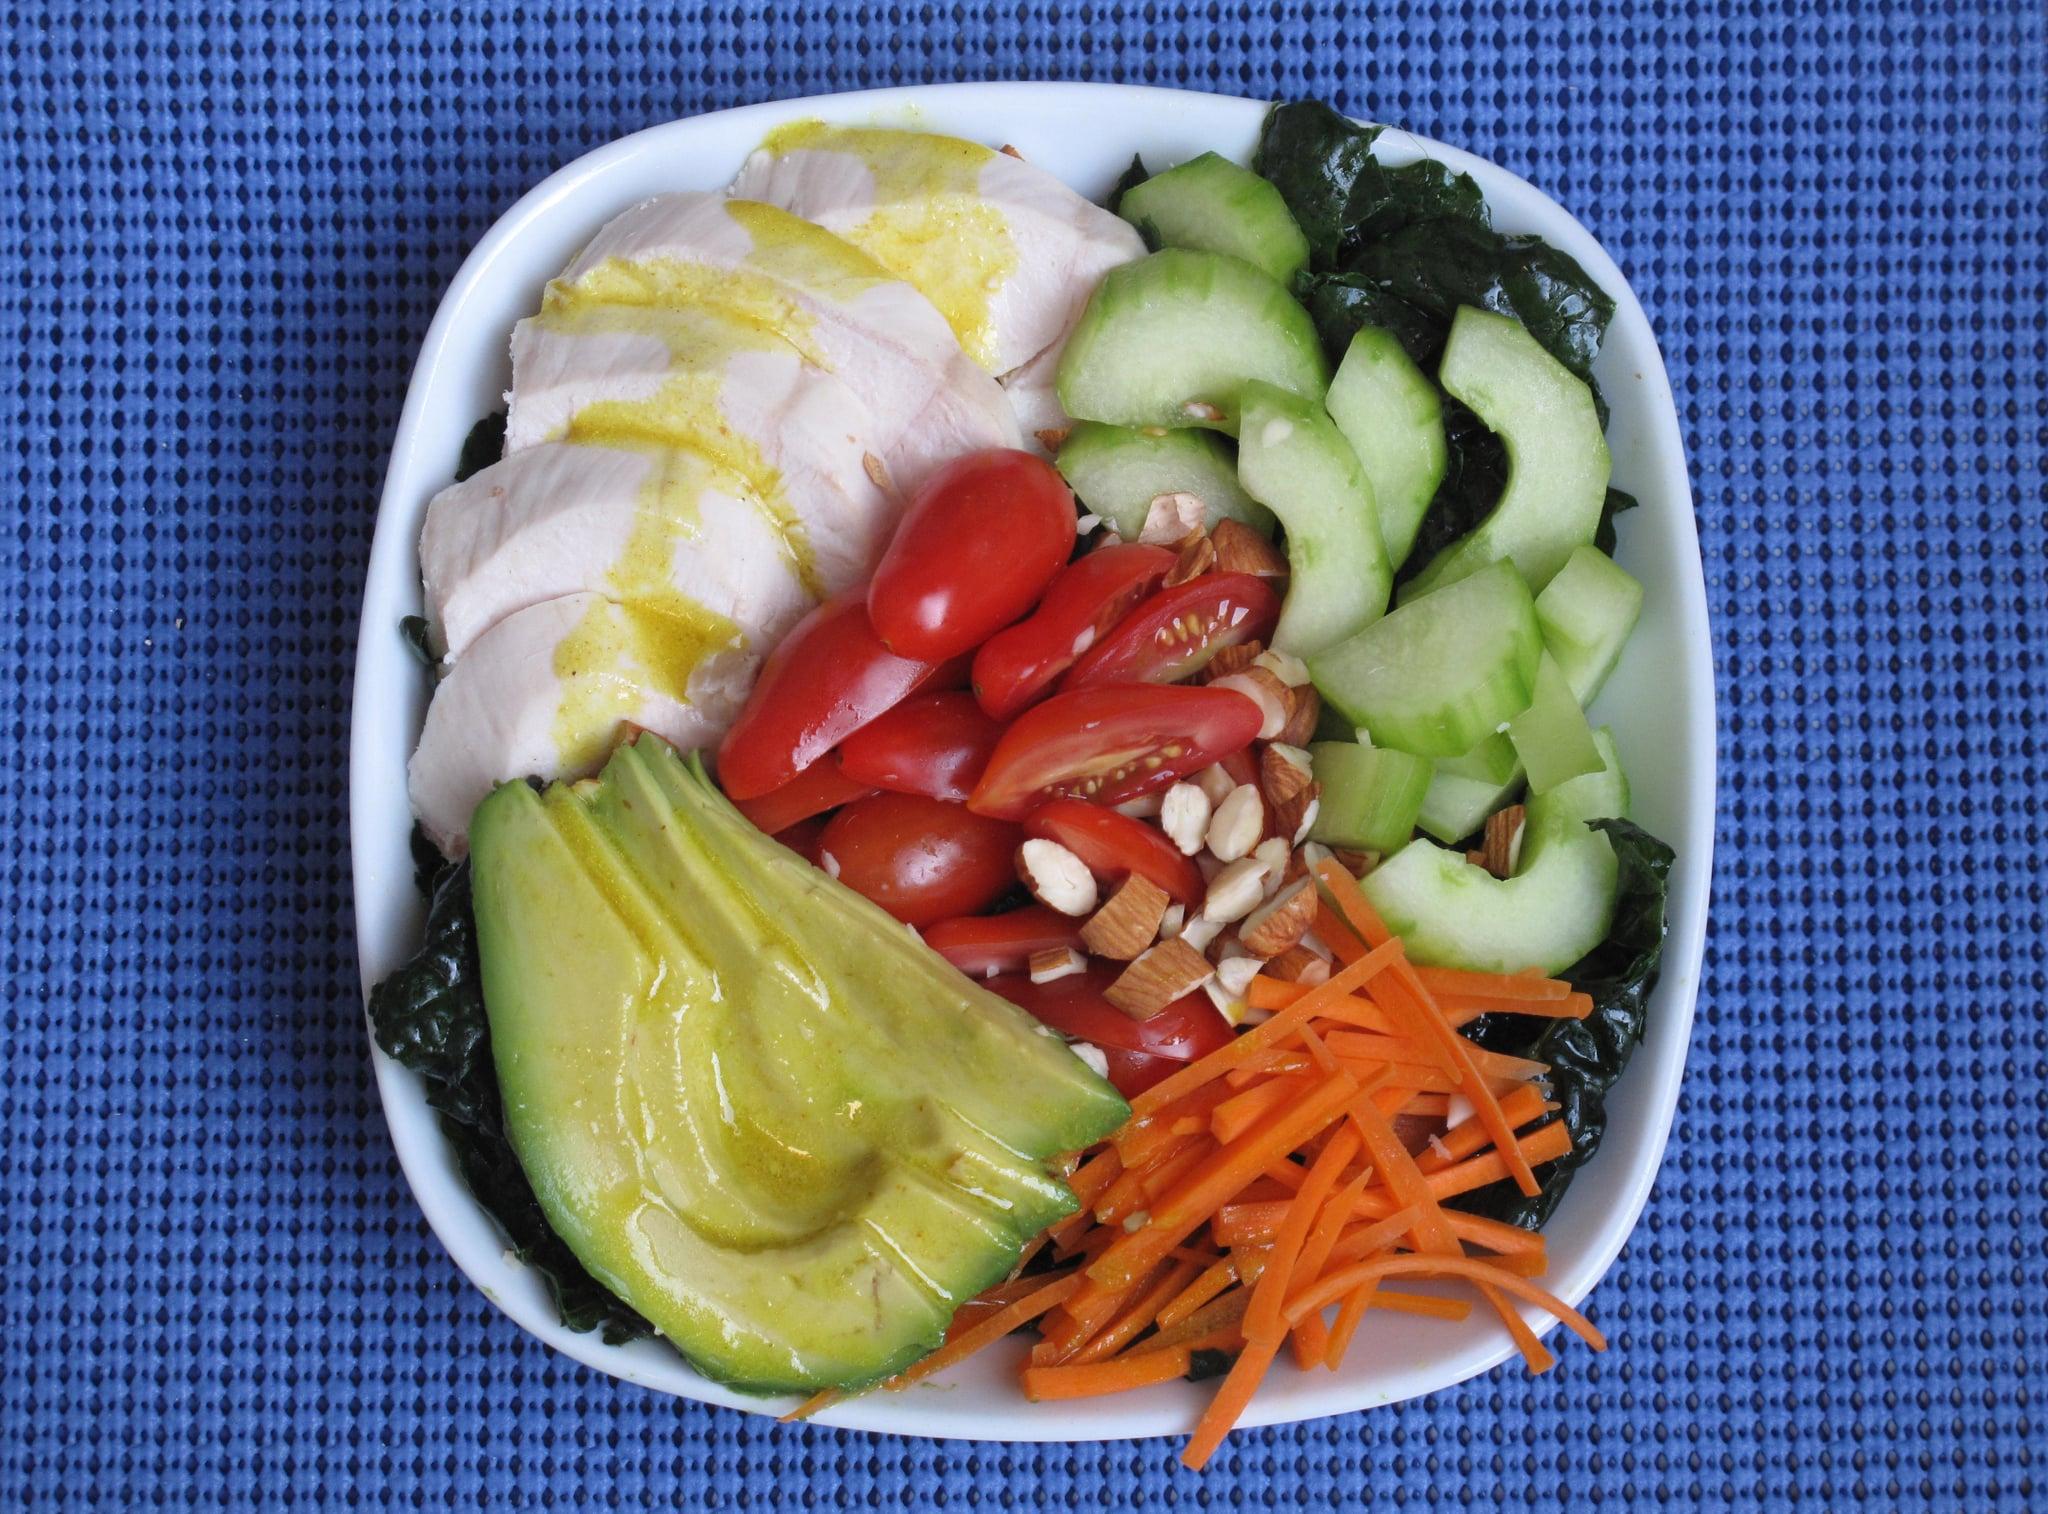 Chicken and Kale Salad With Lemon-Cumin Vinaigrette